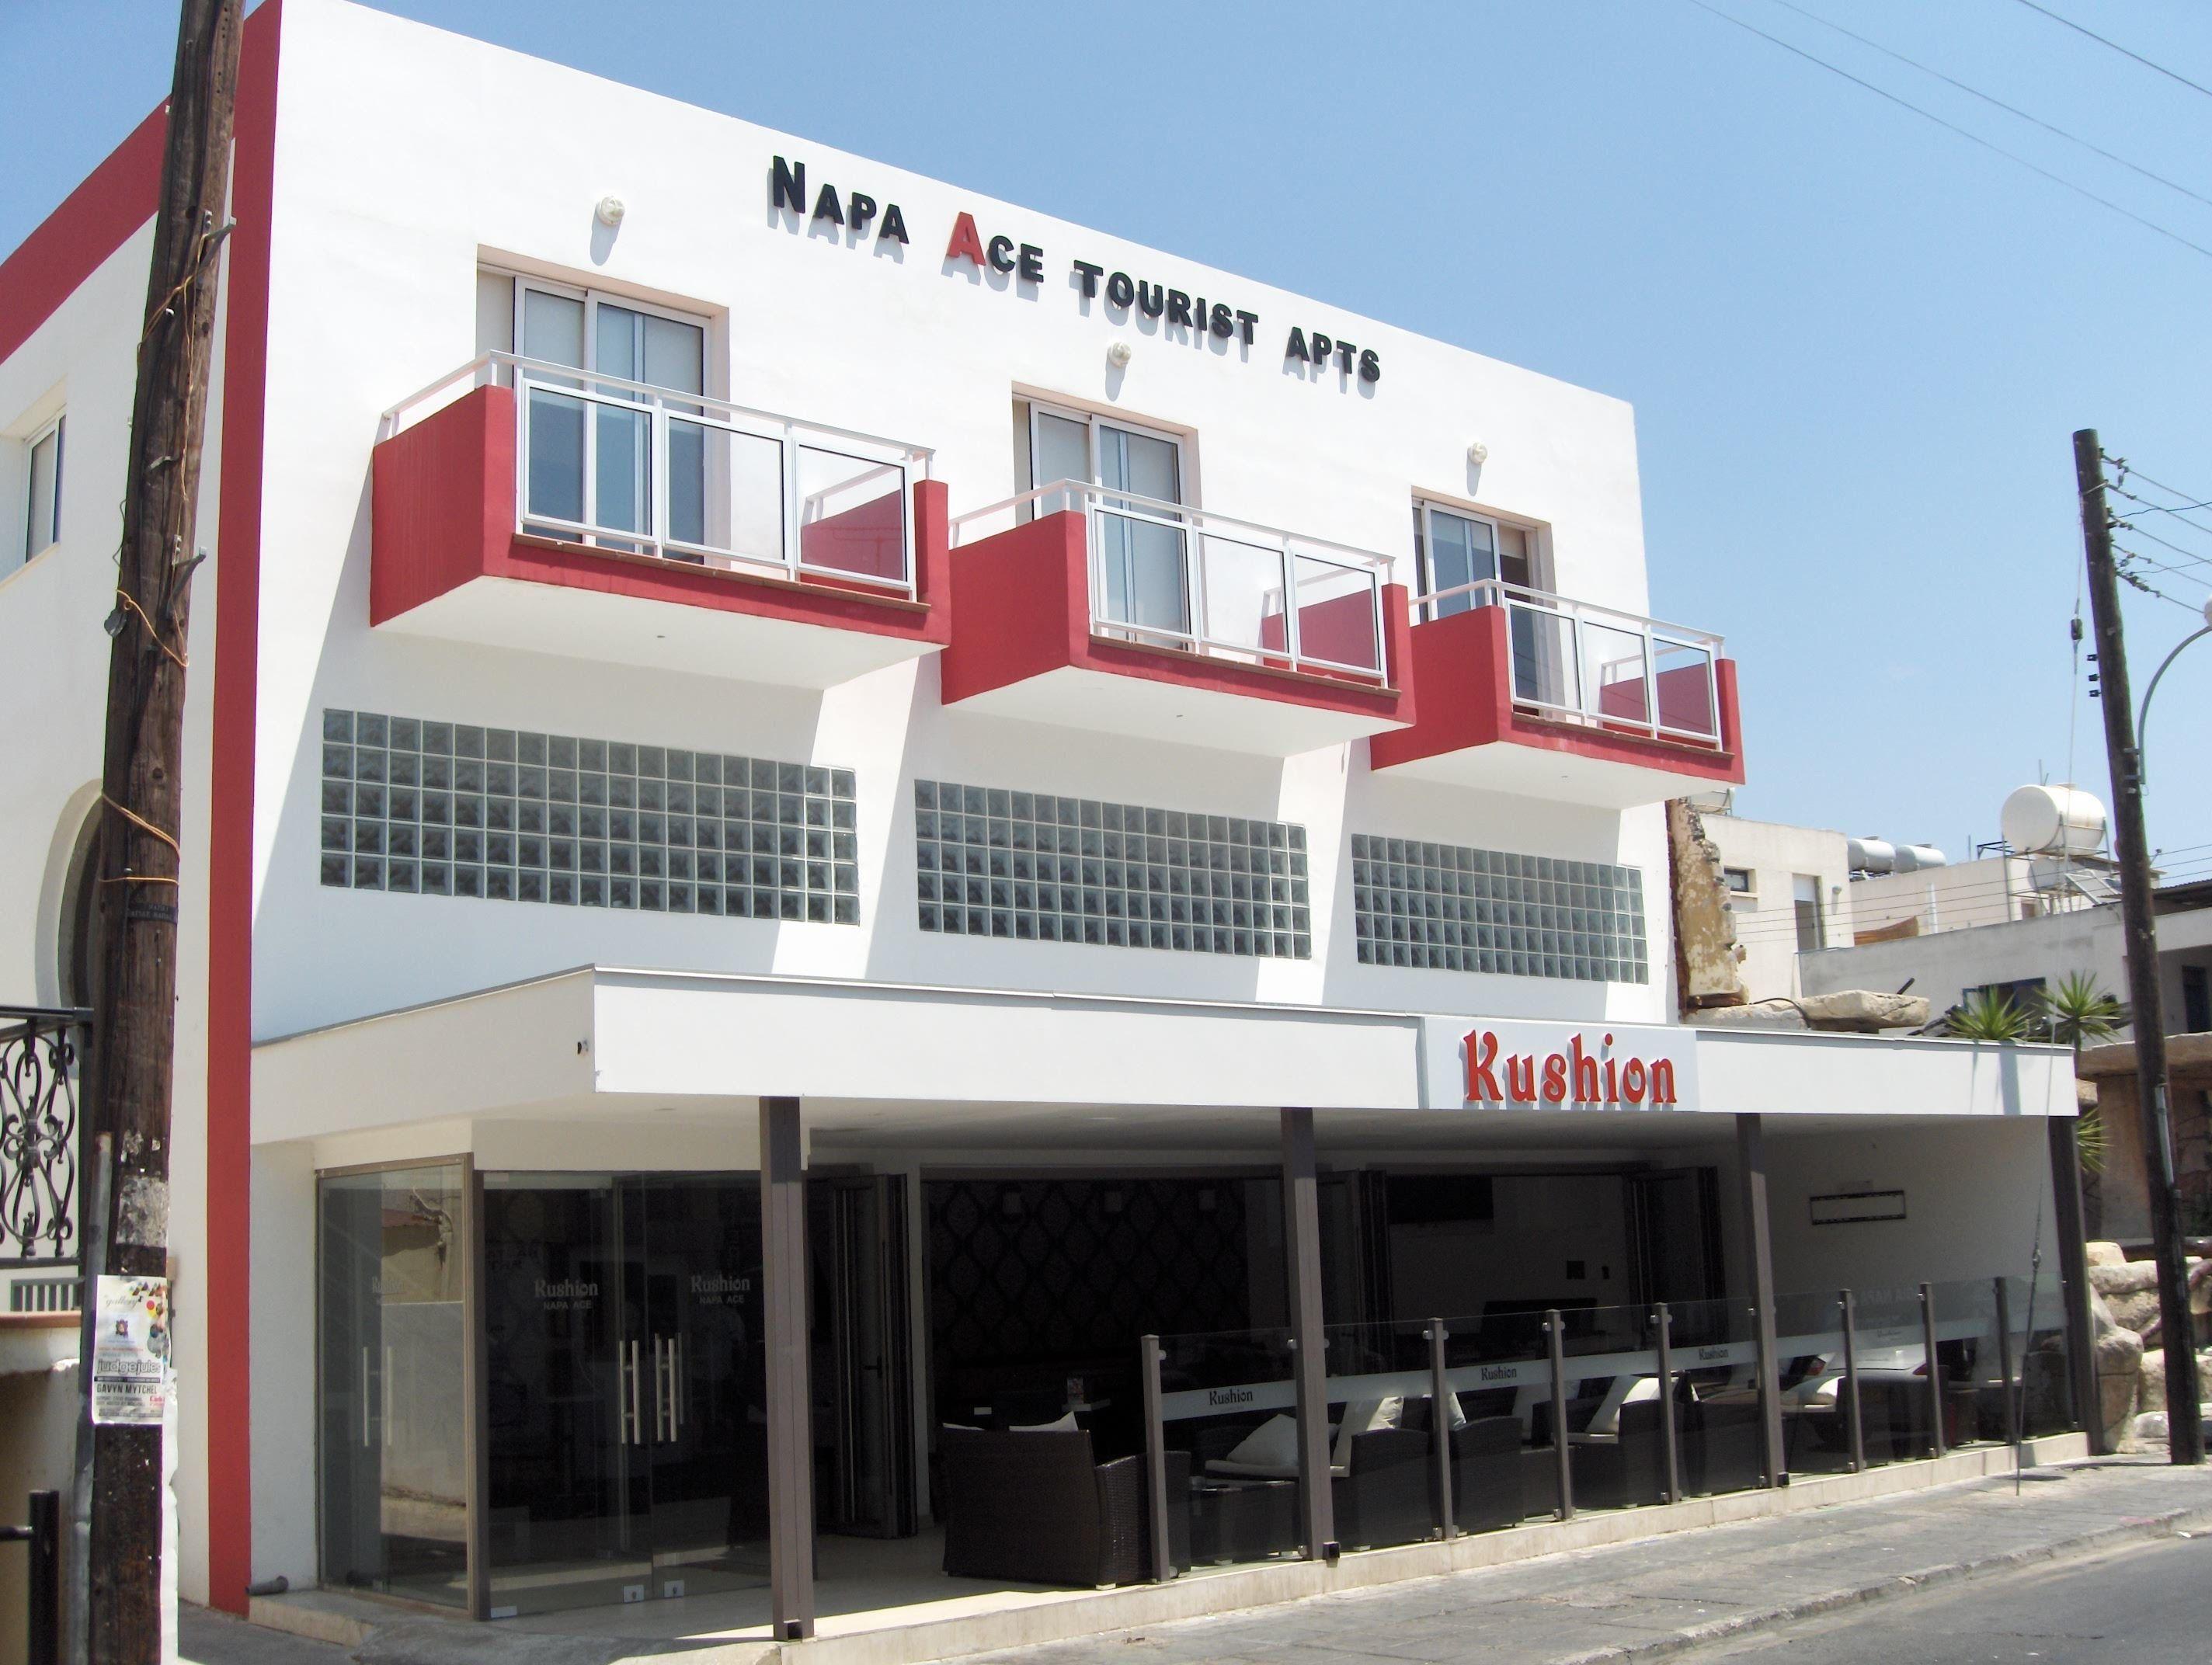 Napa Ace Tourist Apartments